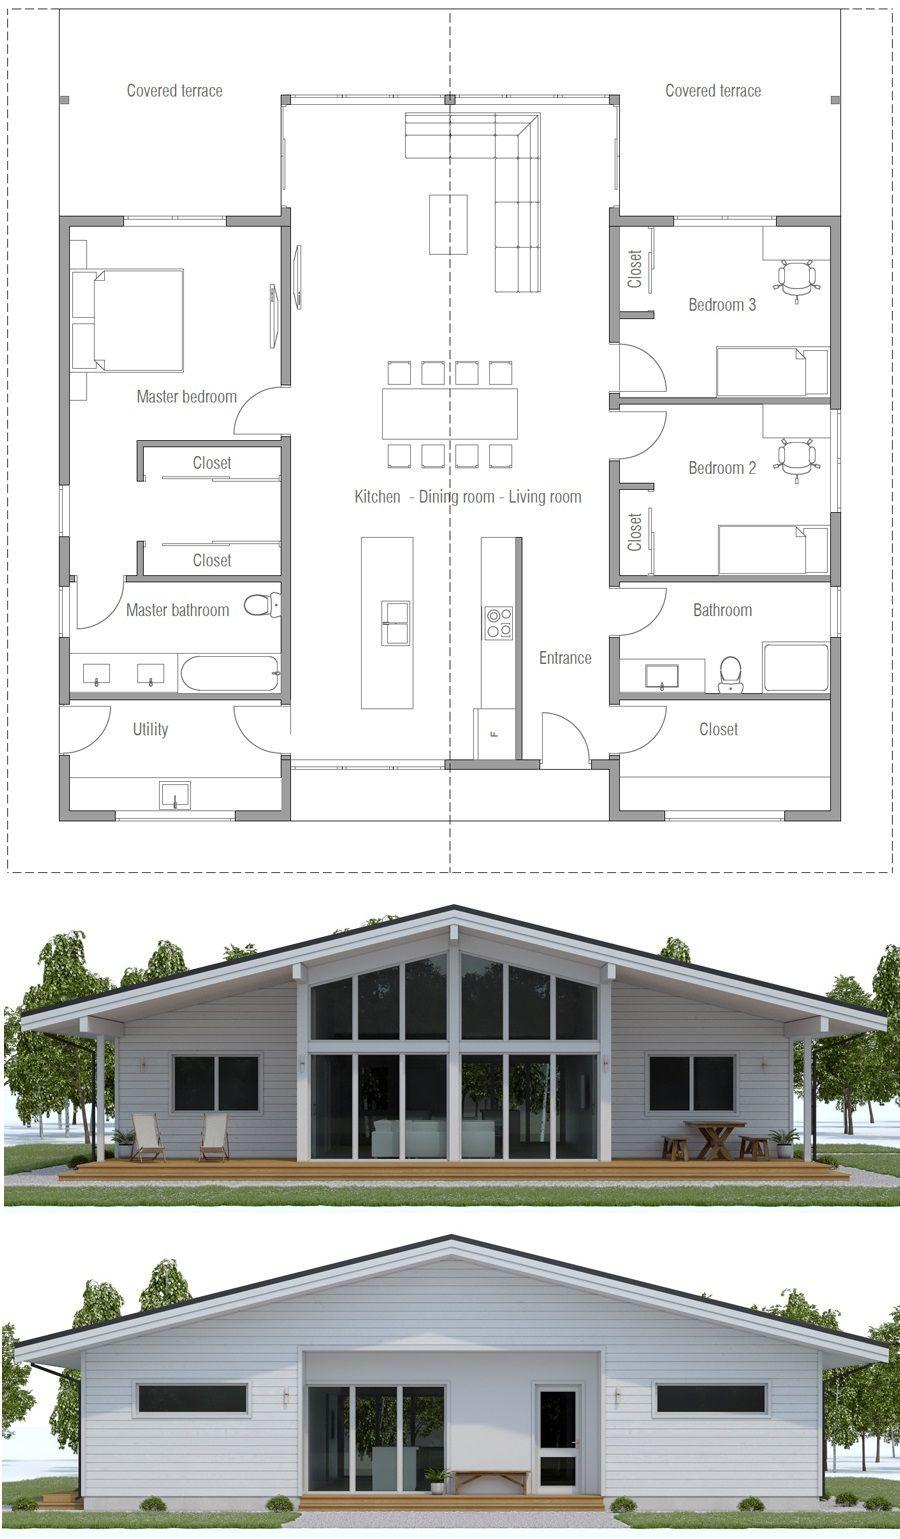 Architecture Plandemaision Container House Plans Floor Plans Contemporary House Plans